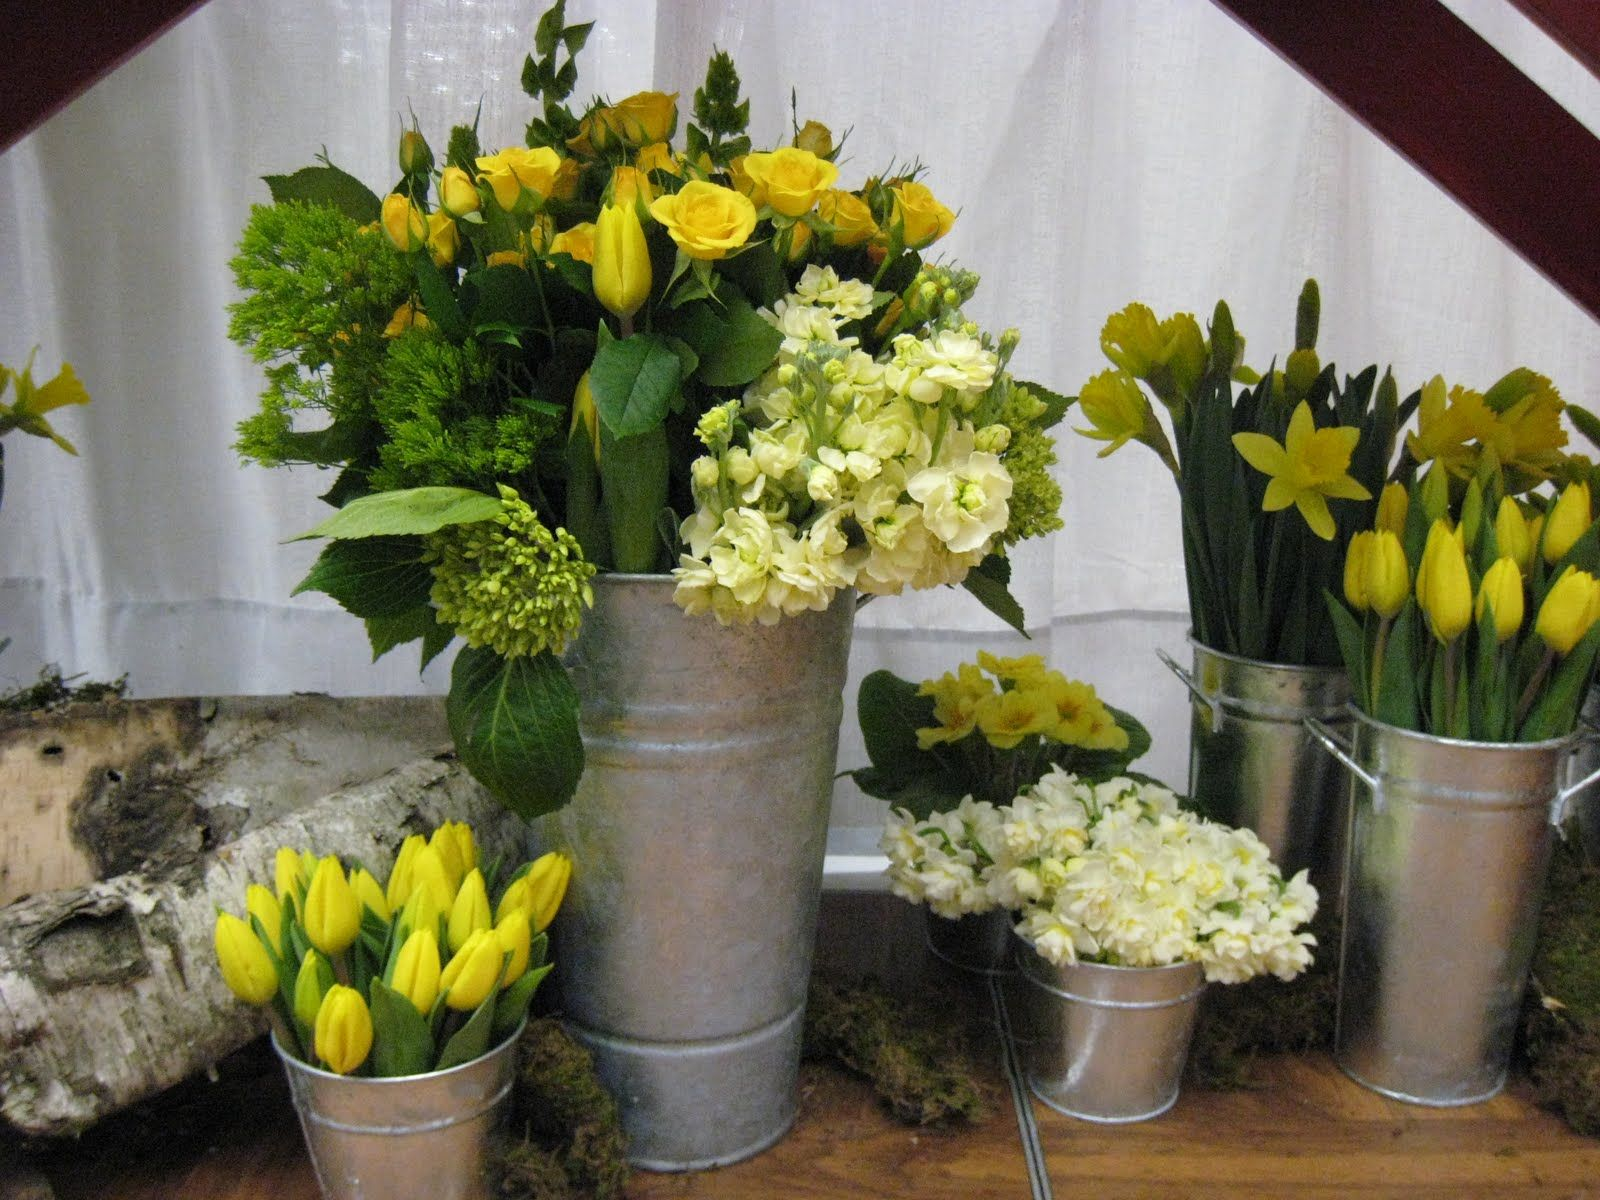 french flower bucket aisle ideas bridal flowers seattle wedding show melanie benson floral. Black Bedroom Furniture Sets. Home Design Ideas